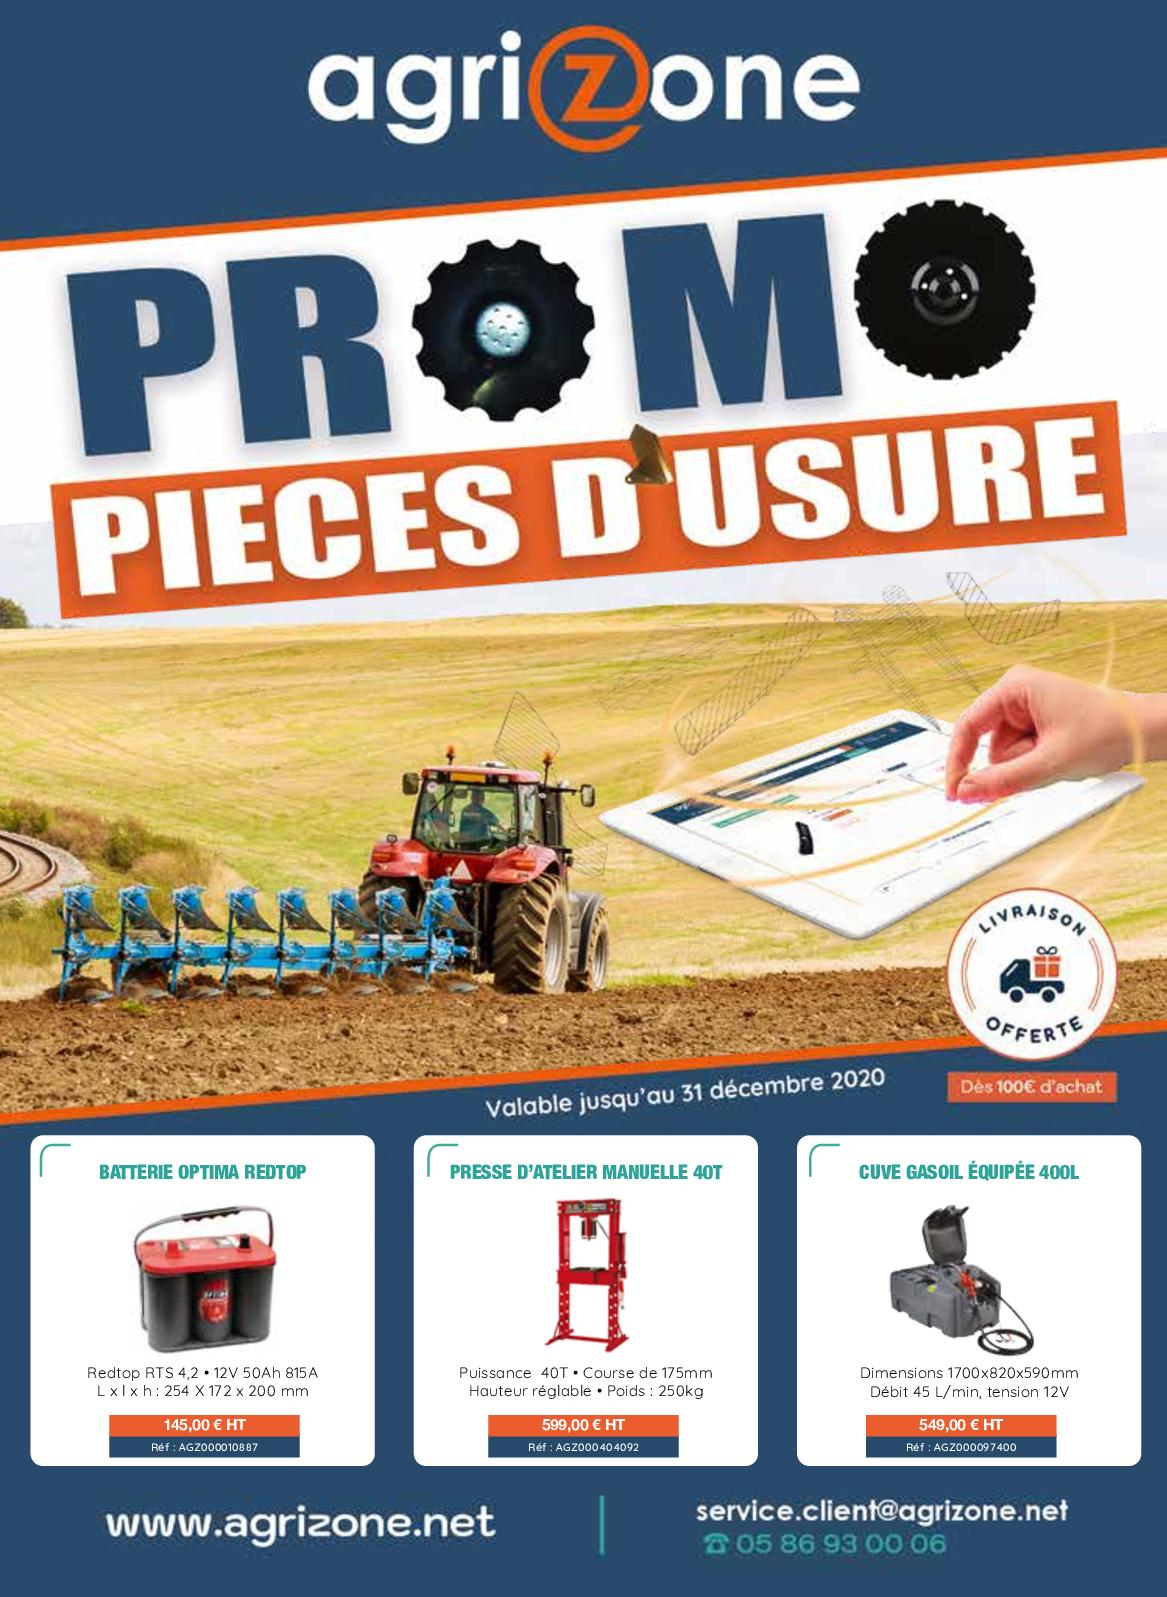 Calameo Mailing Piece D Usure Agrizone 2020